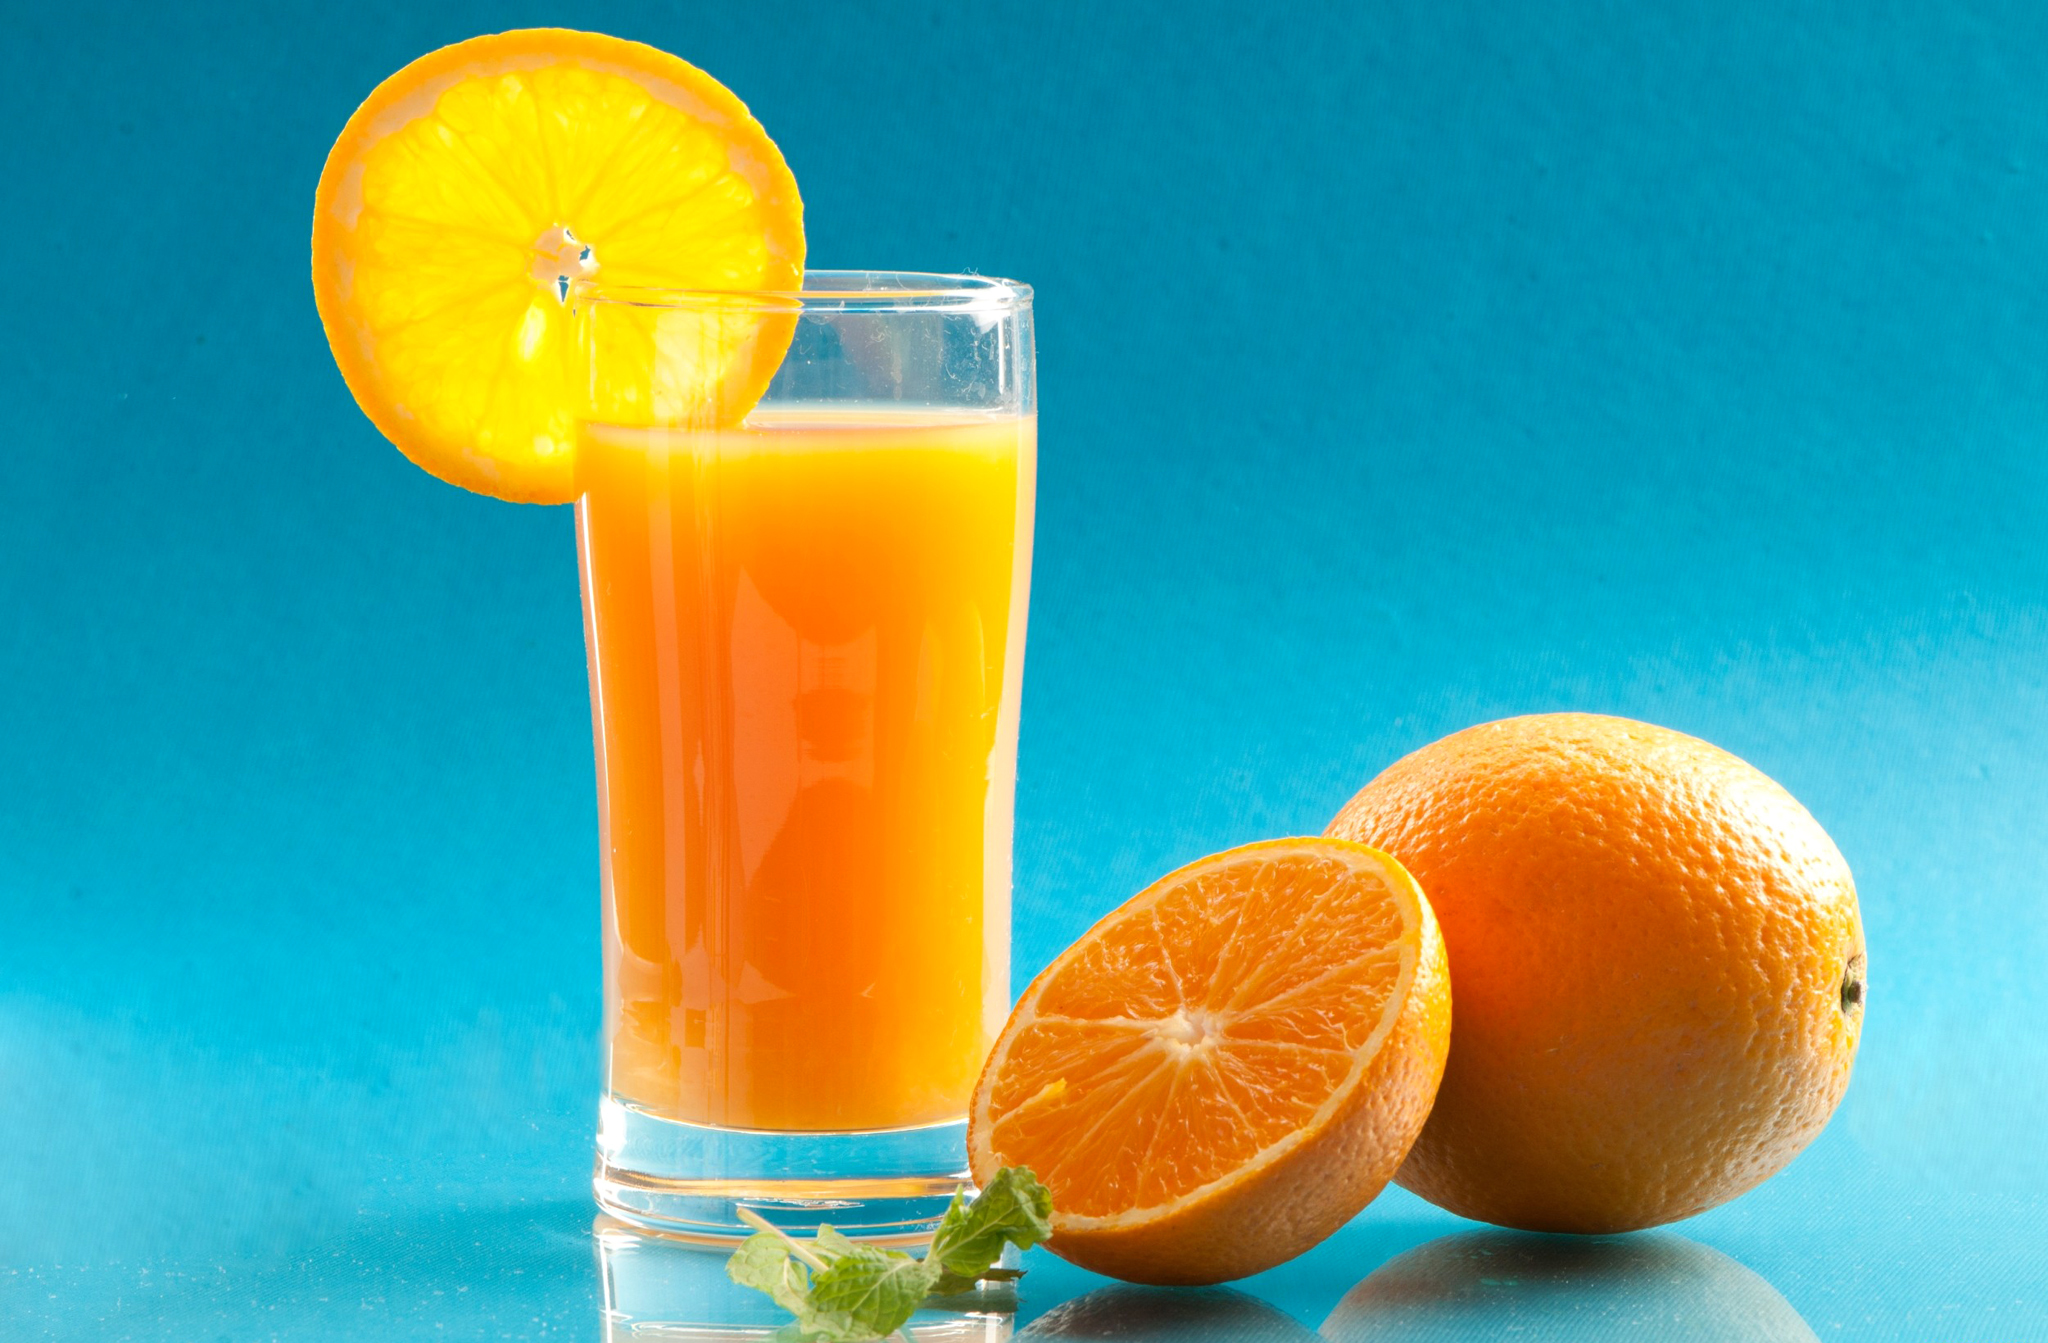 еда апельсин сок food orange juice без смс